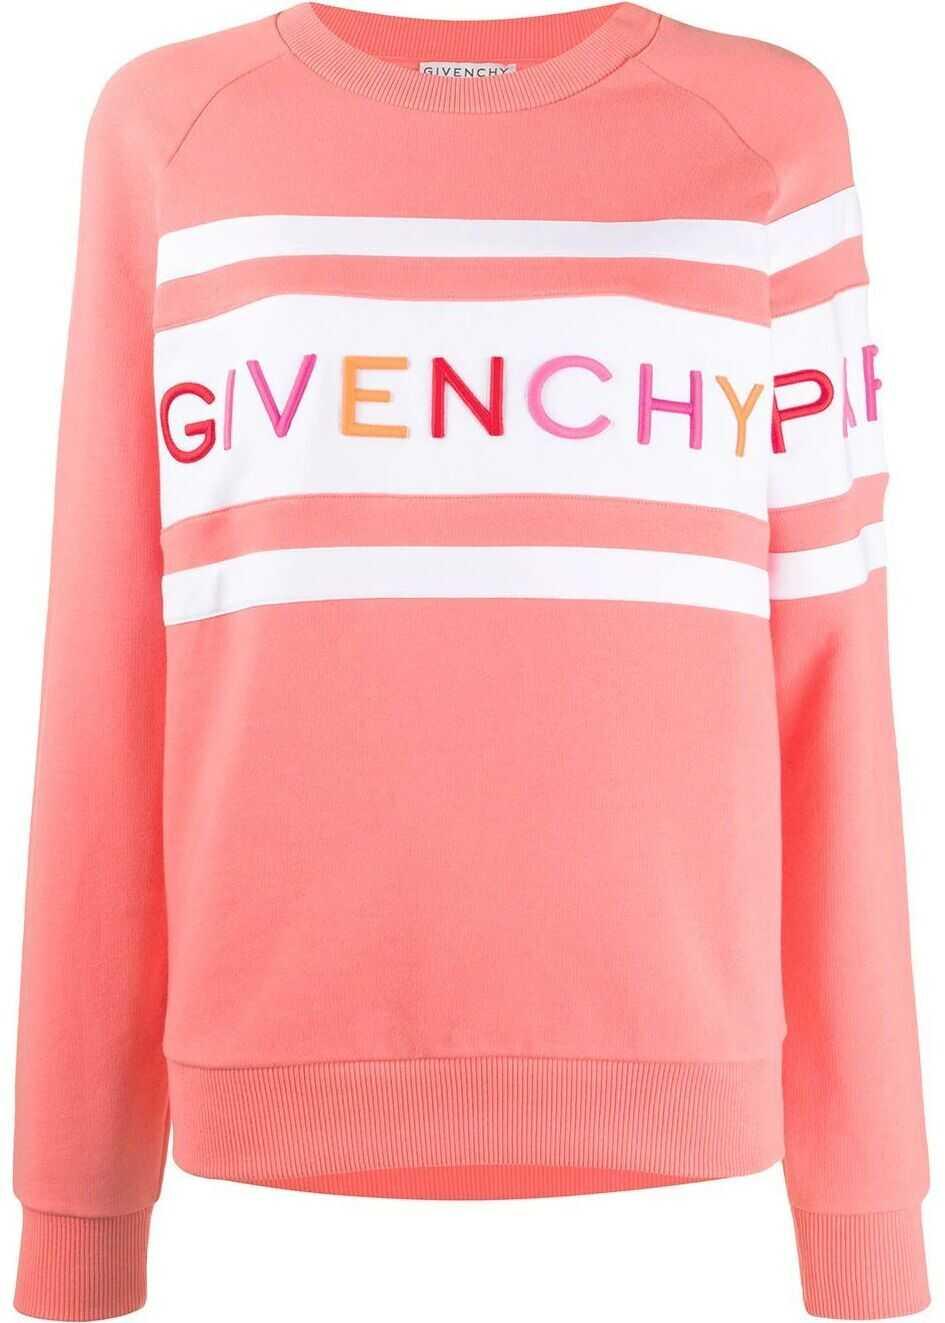 Givenchy Cotton Sweatshirt PINK